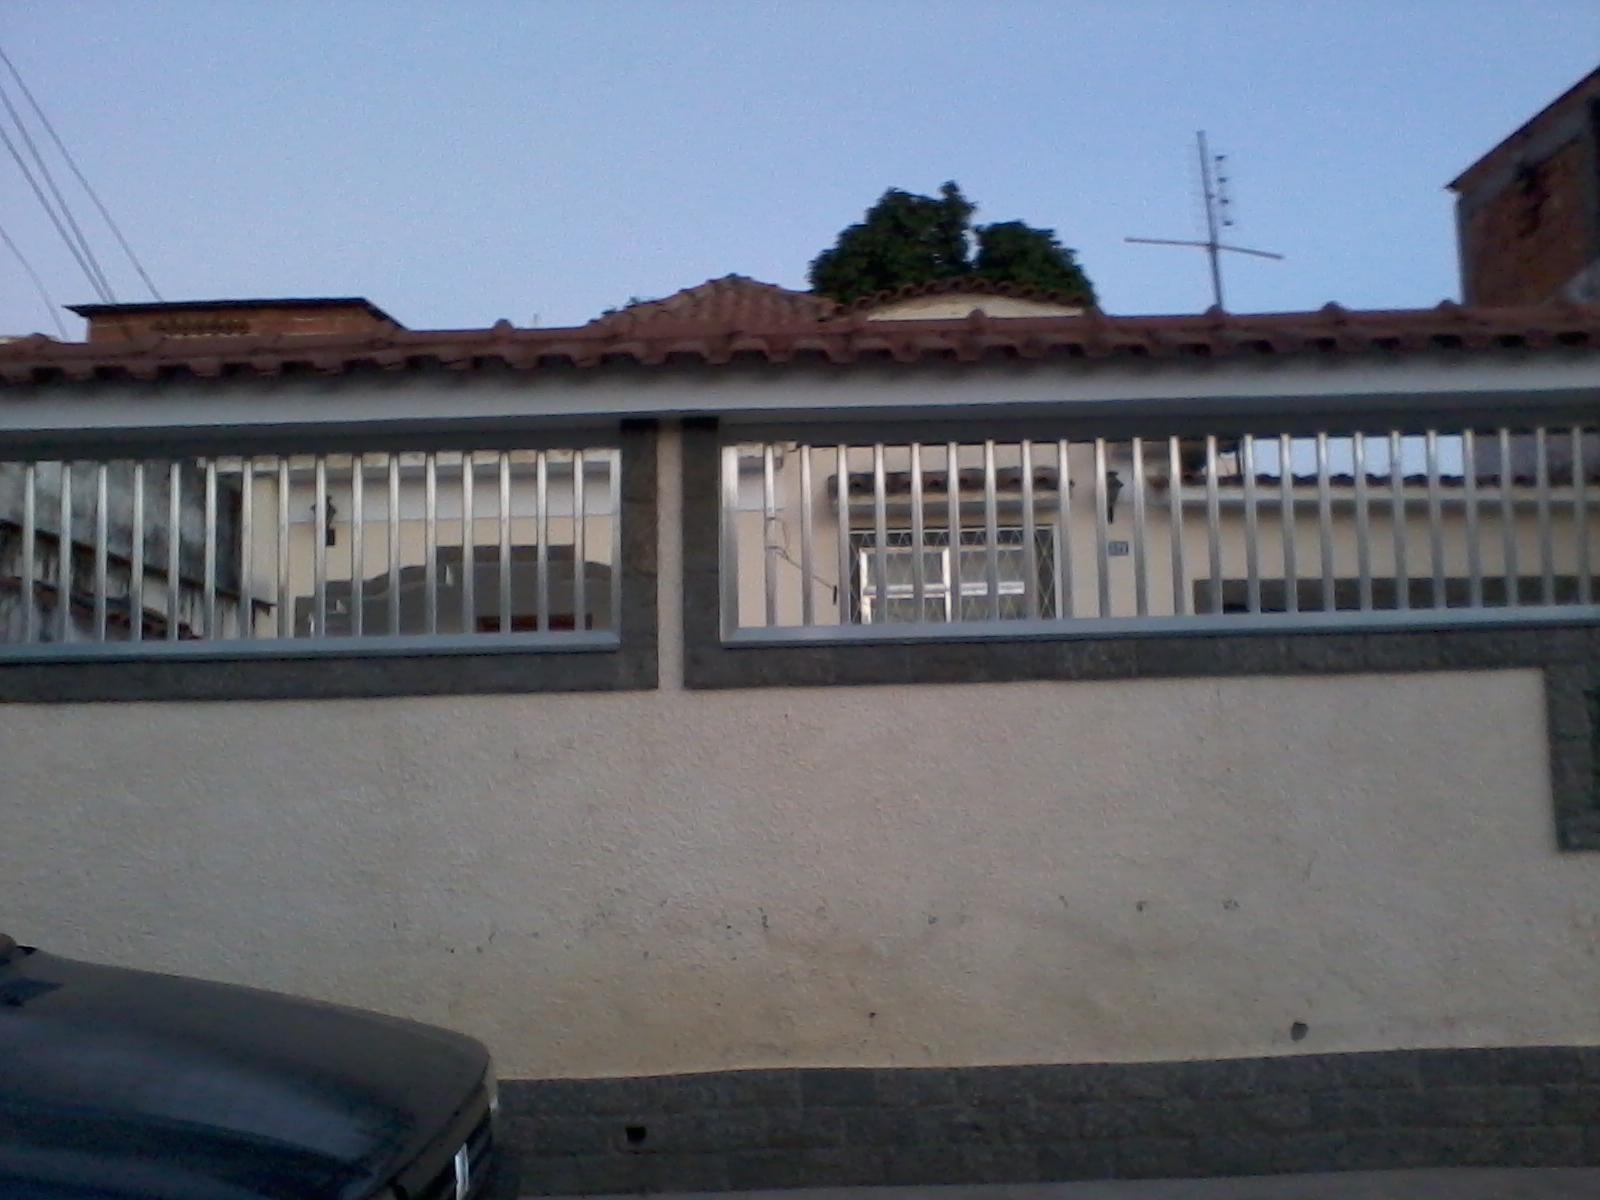 #385D93  ZONA NORTE RJ: Grades Serralheria Zona Norte Rj Alumínio e 2016 Janela De Aluminio Zona Sul